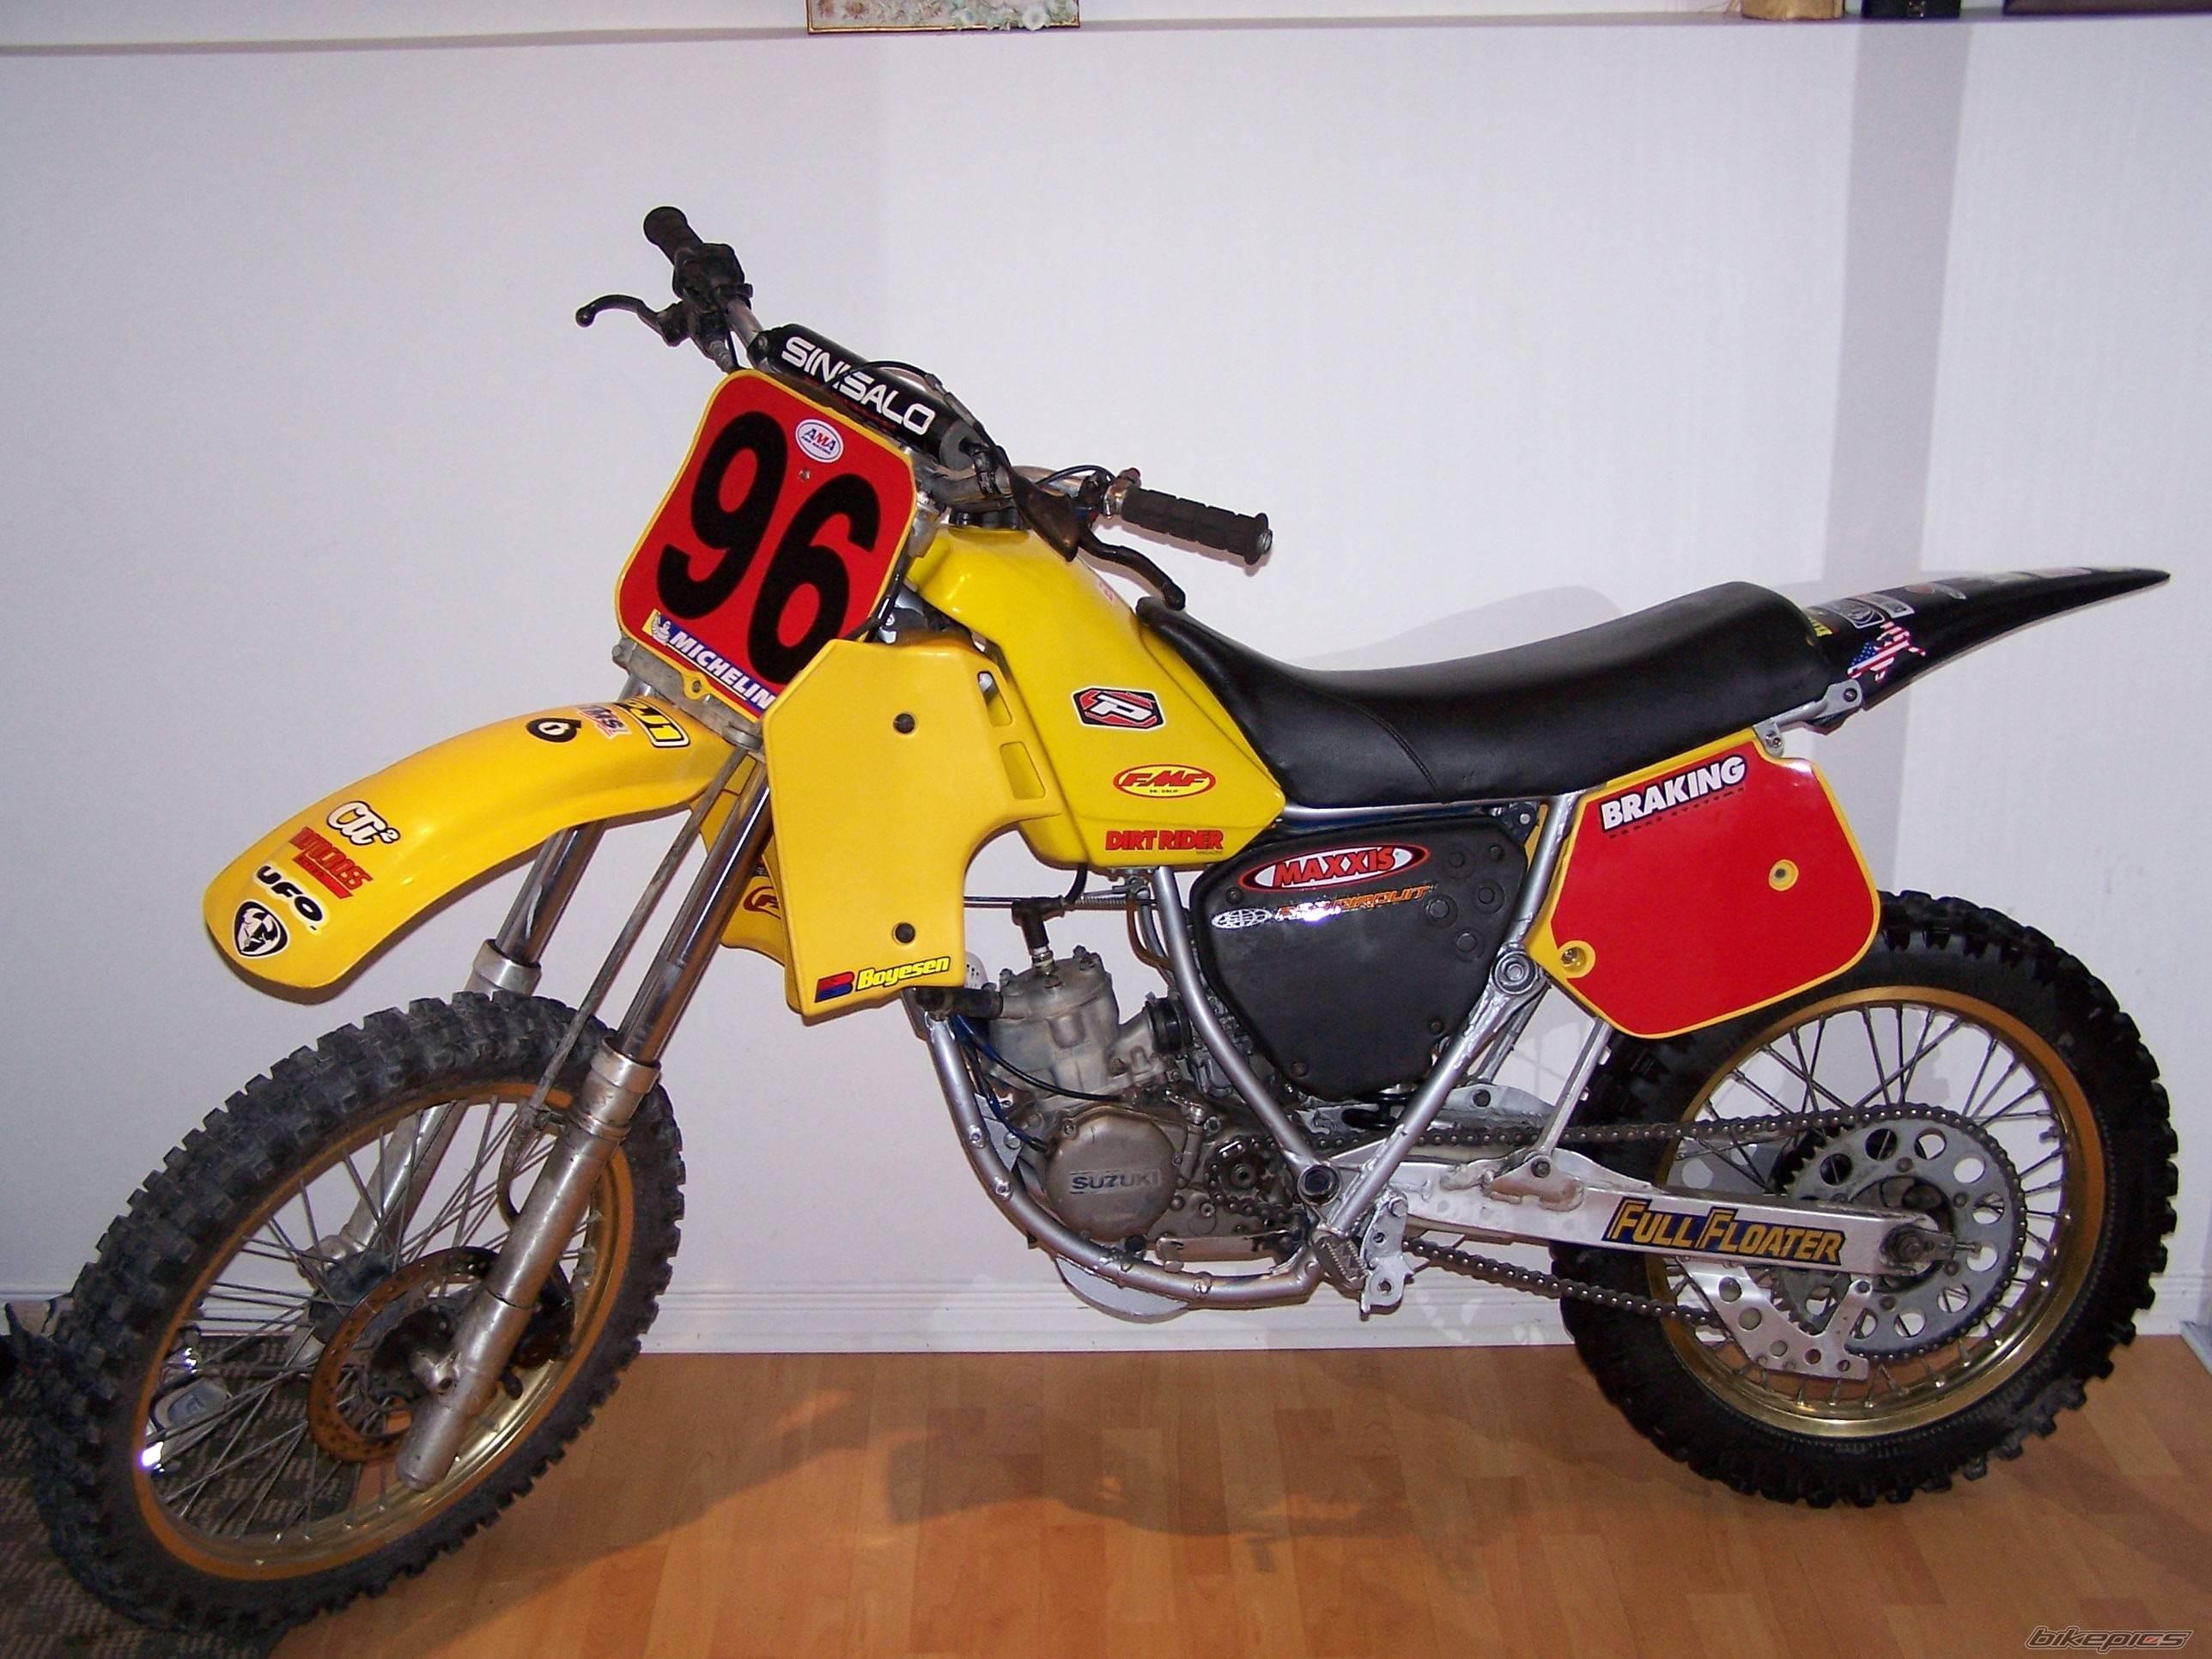 Suzuki GN 125 | 1986-2001.Kantensteinlegenden | Lars Simon